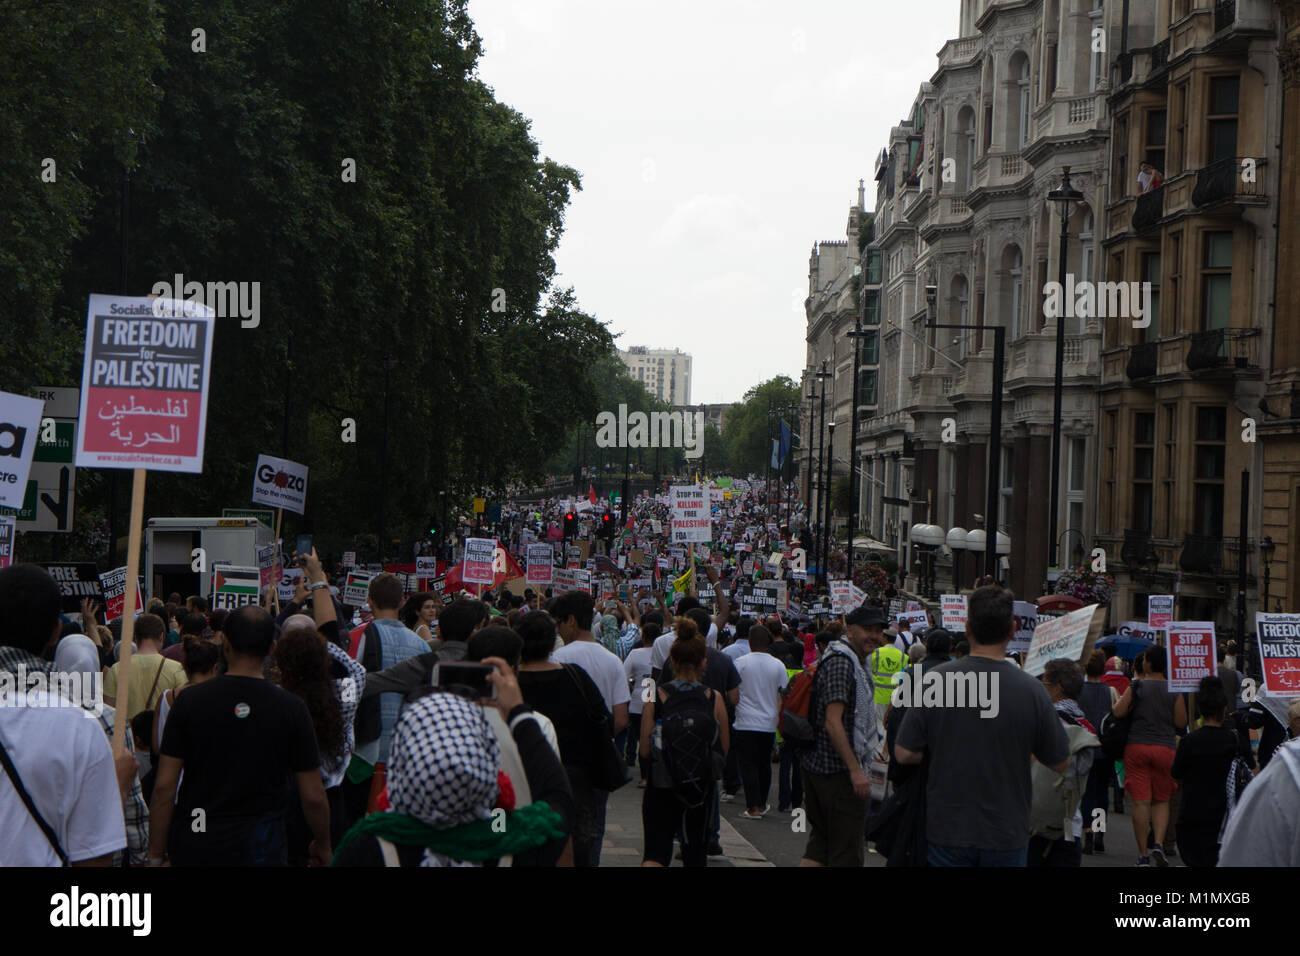 Gaza Demonstration - Free Palestine March - Stock Image